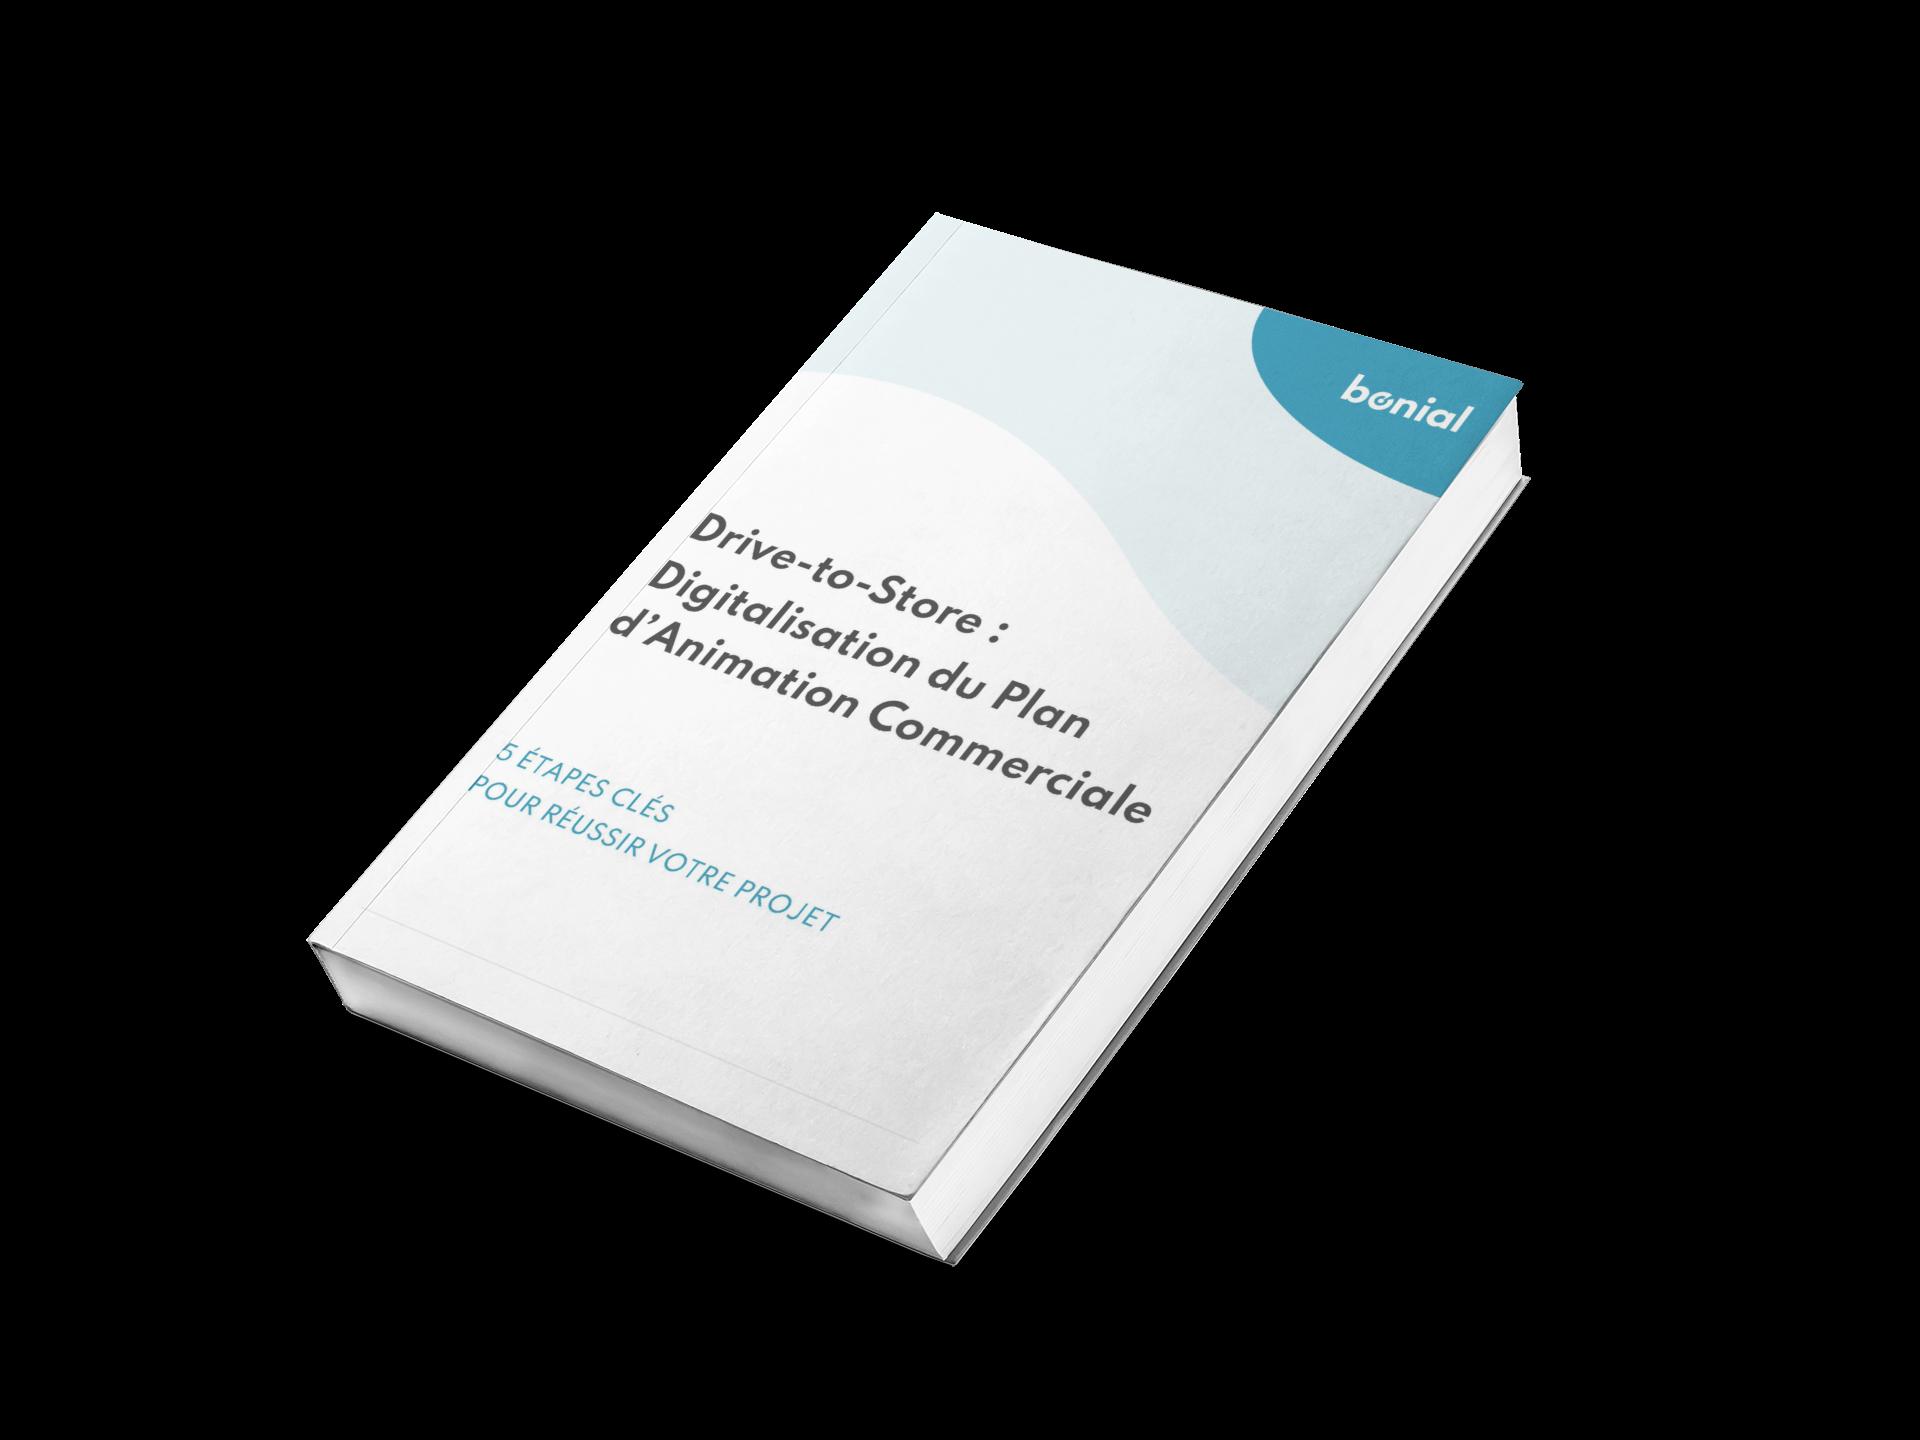 BON-Ebook-Digitalisation_PAC-Mockup_contenu-210216-Placeit01